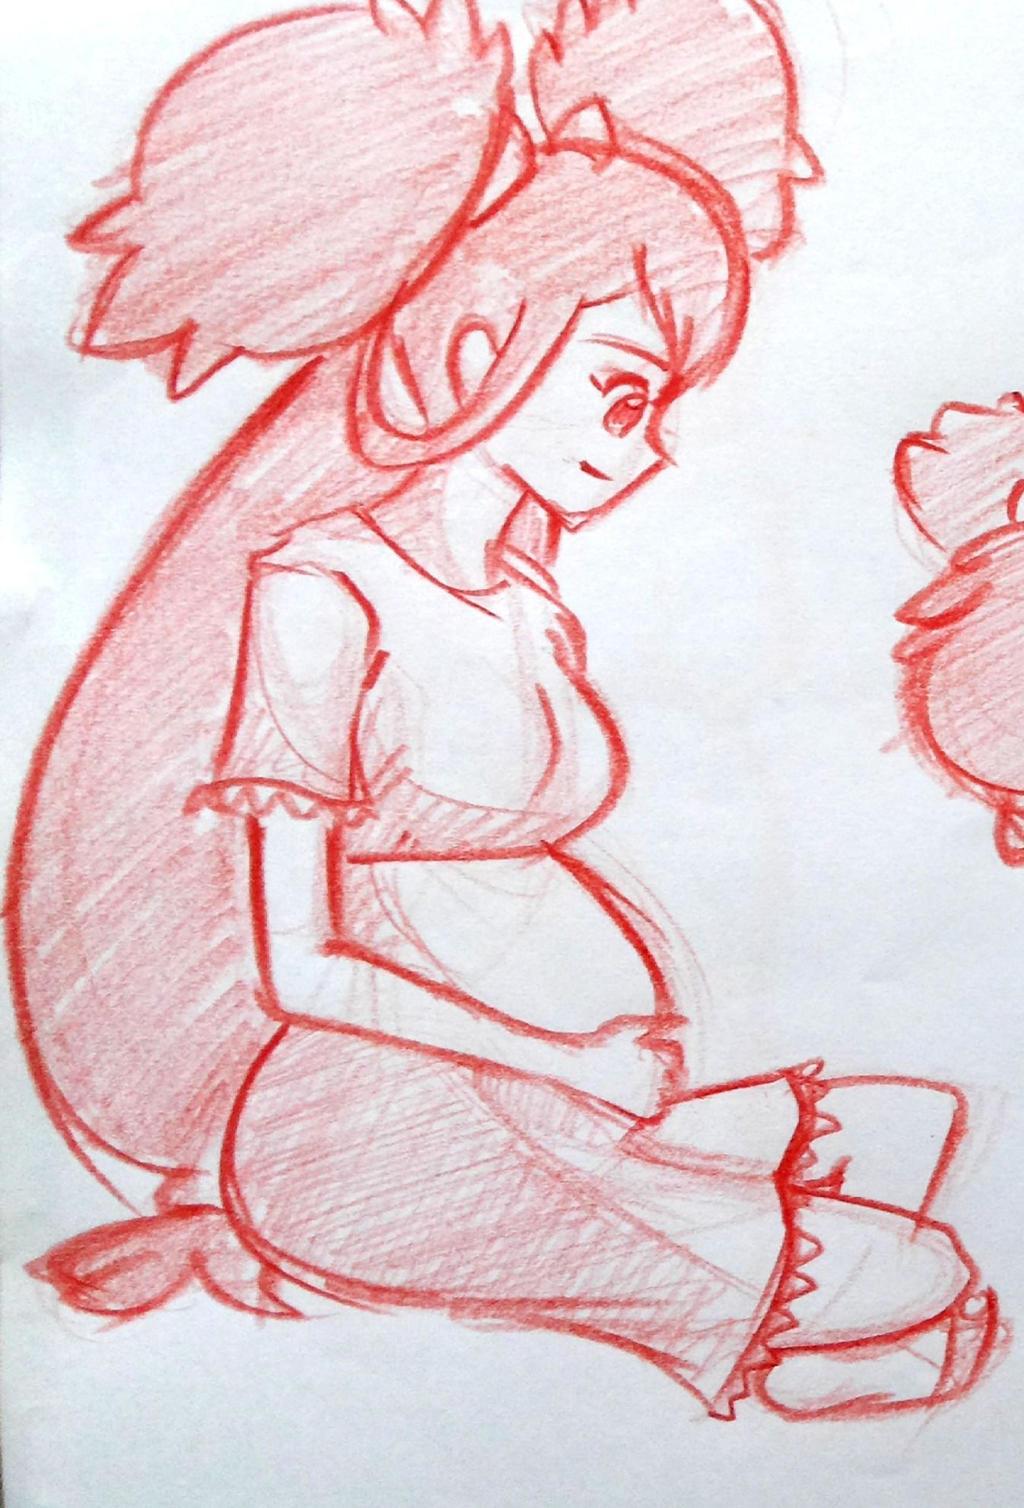 Pokemon Iris pregnant 02 by Skyfer7 on DeviantArt